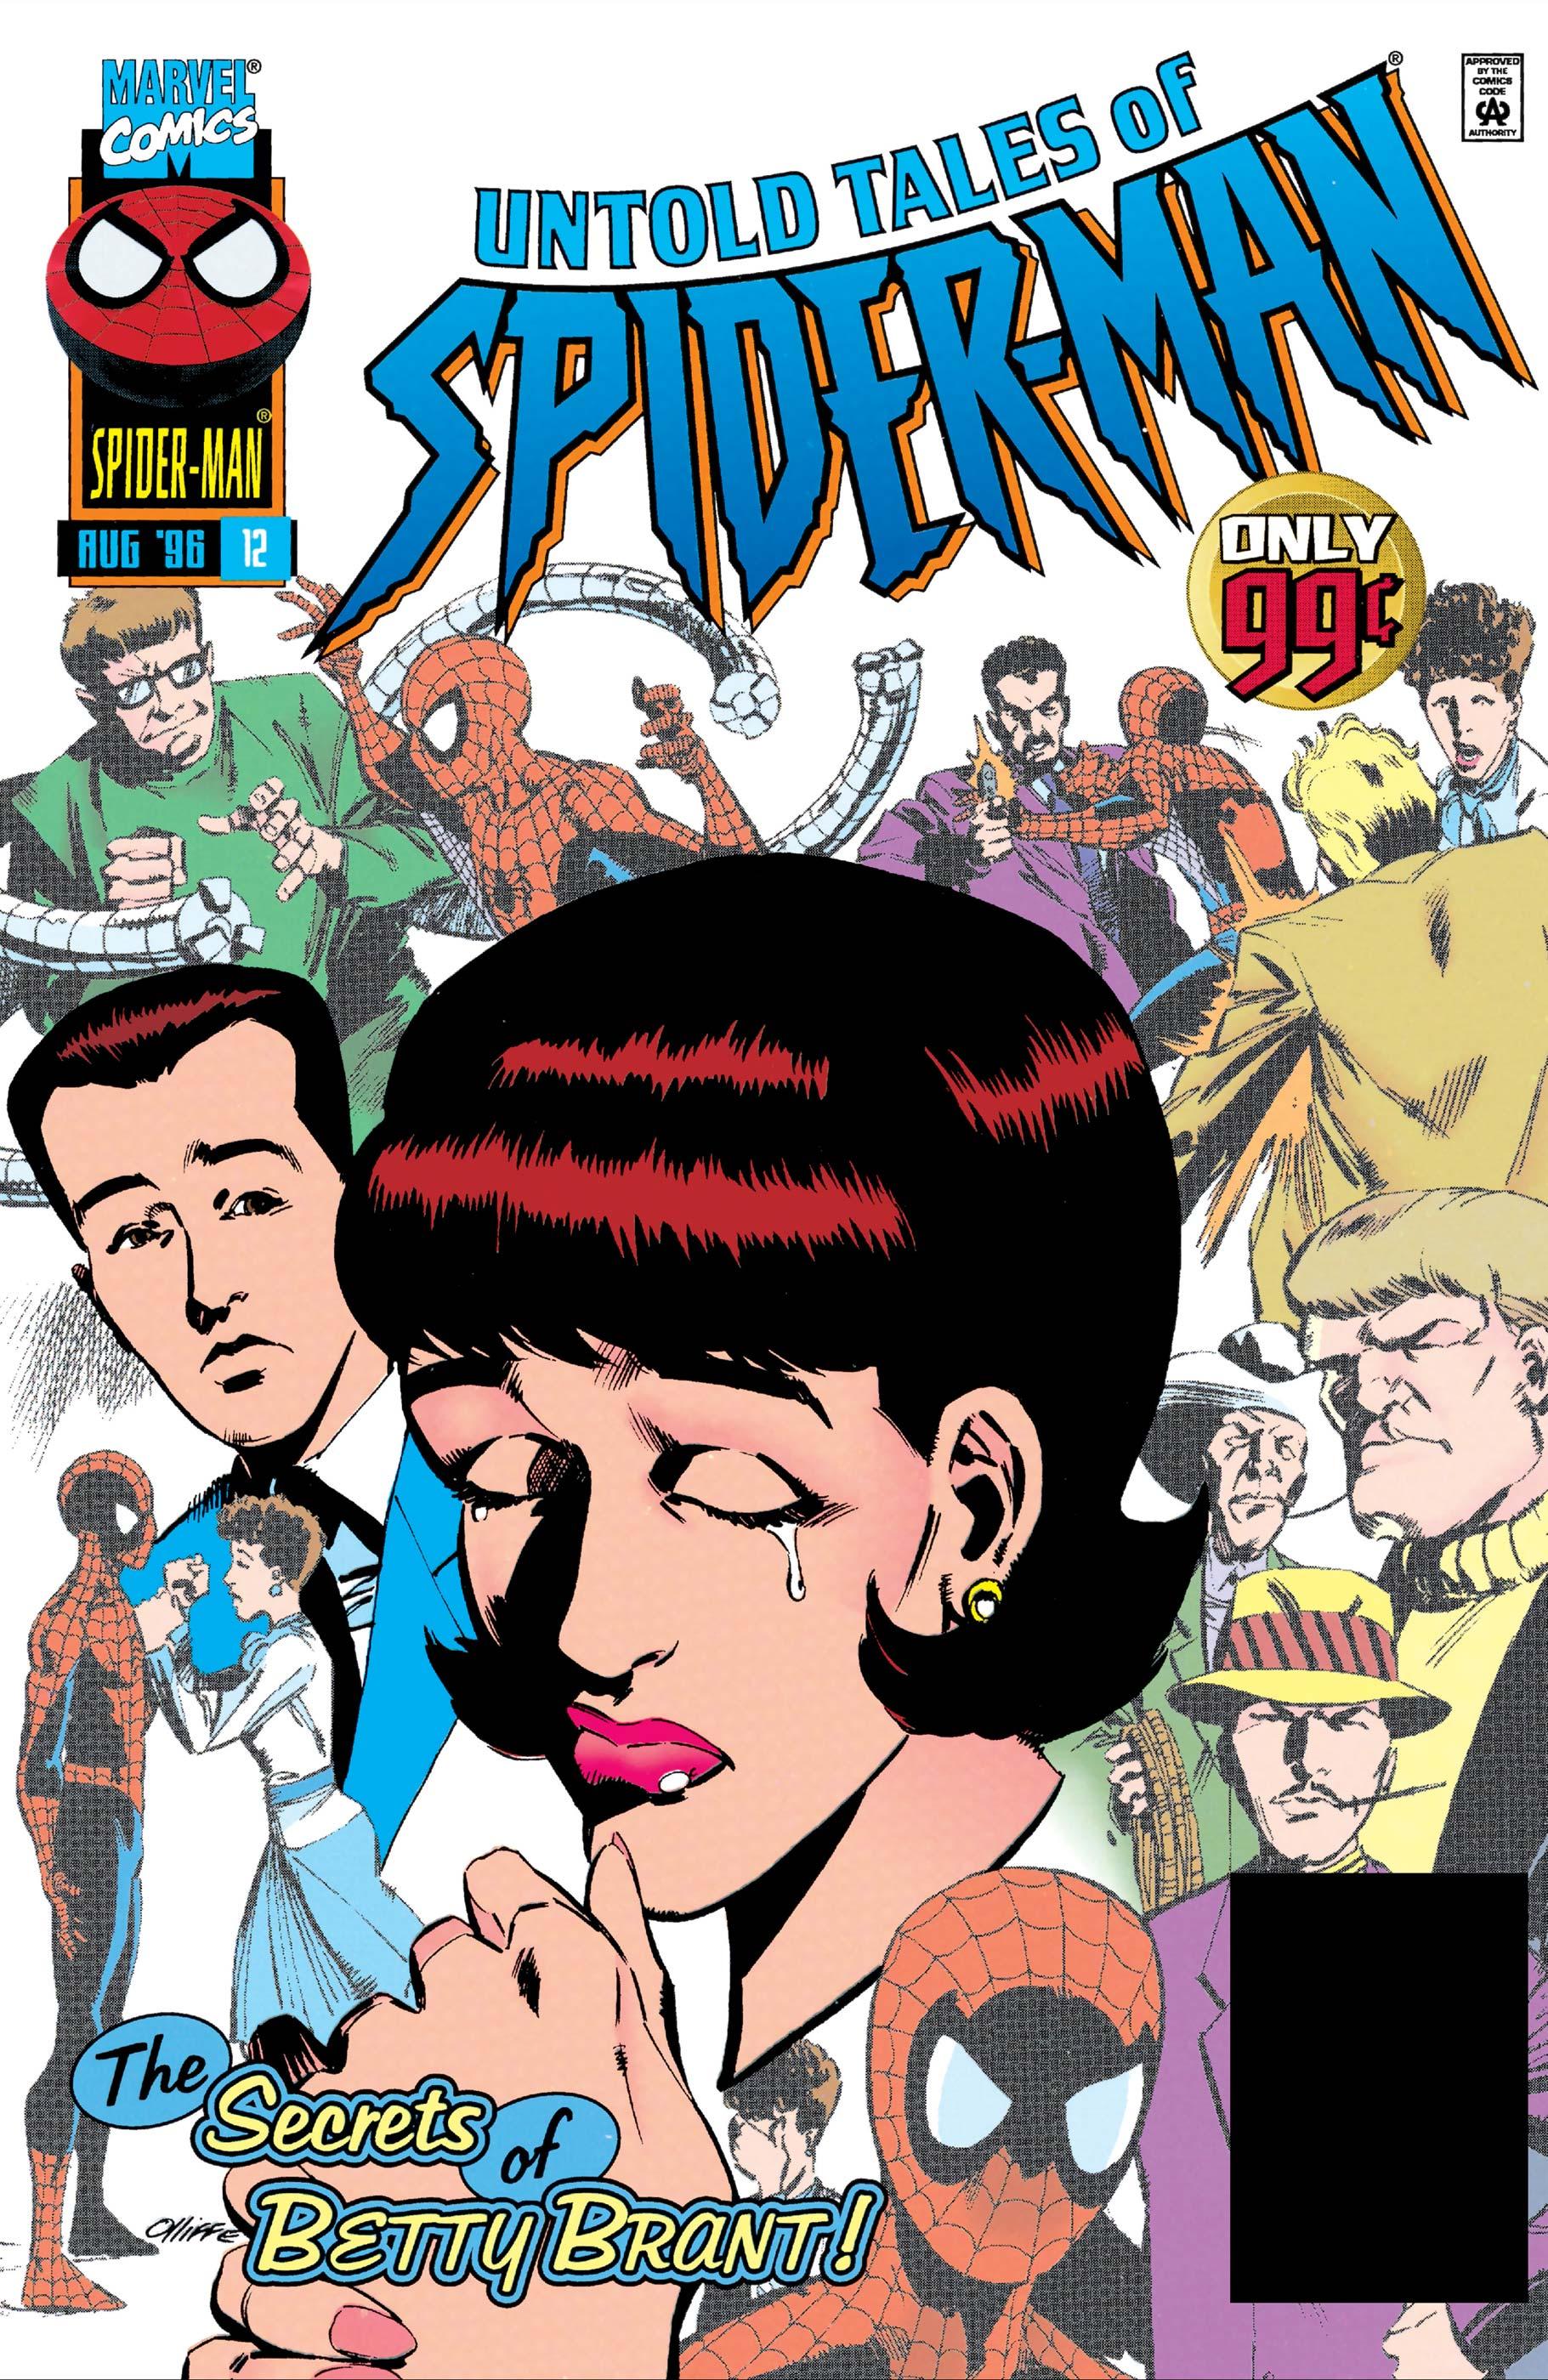 Untold Tales of Spider-Man (1995) #12